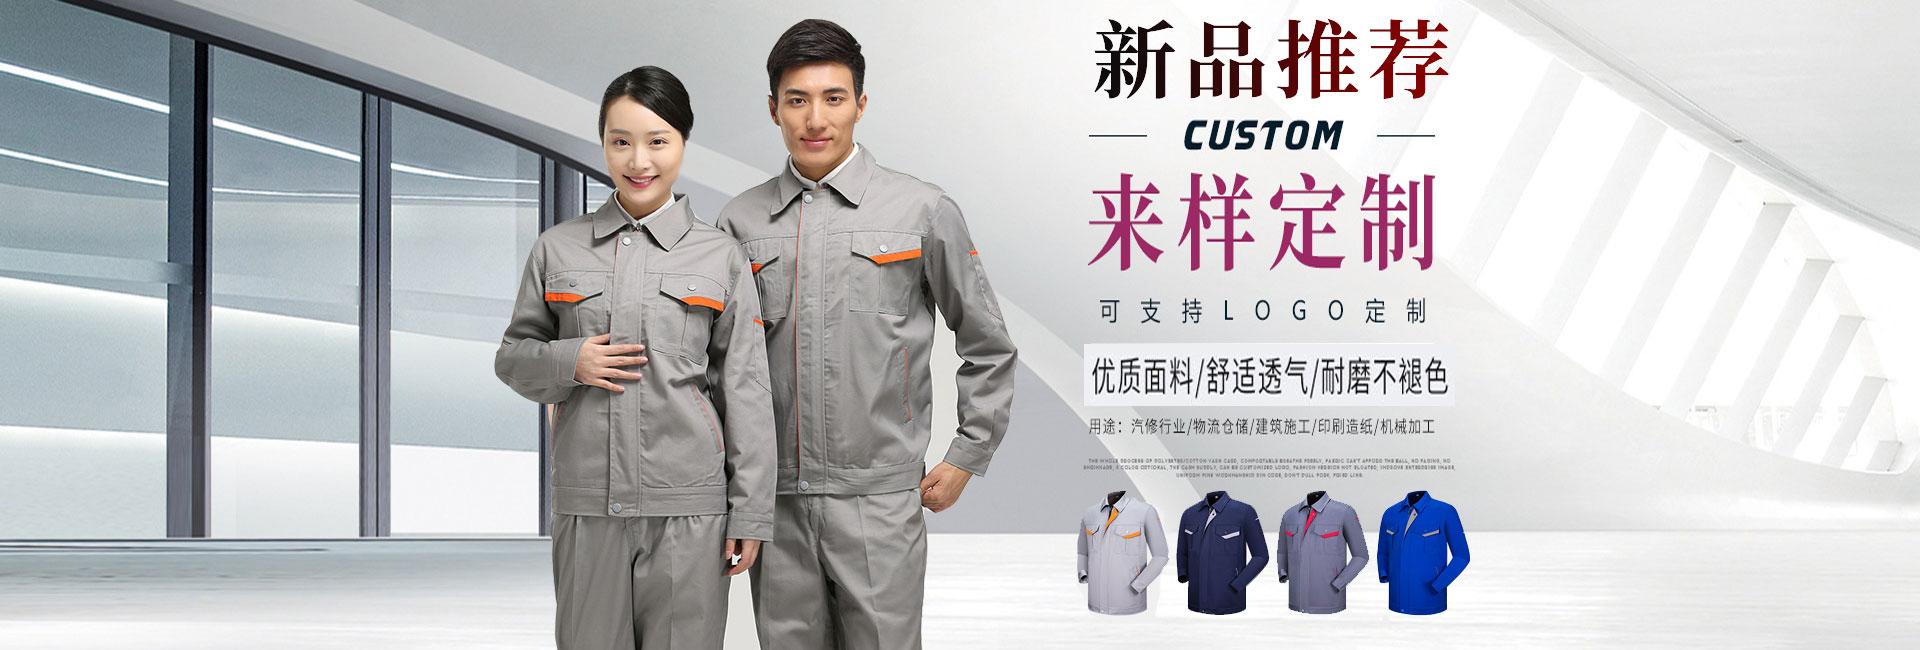 北京vwin官方网站德赢vwin官网